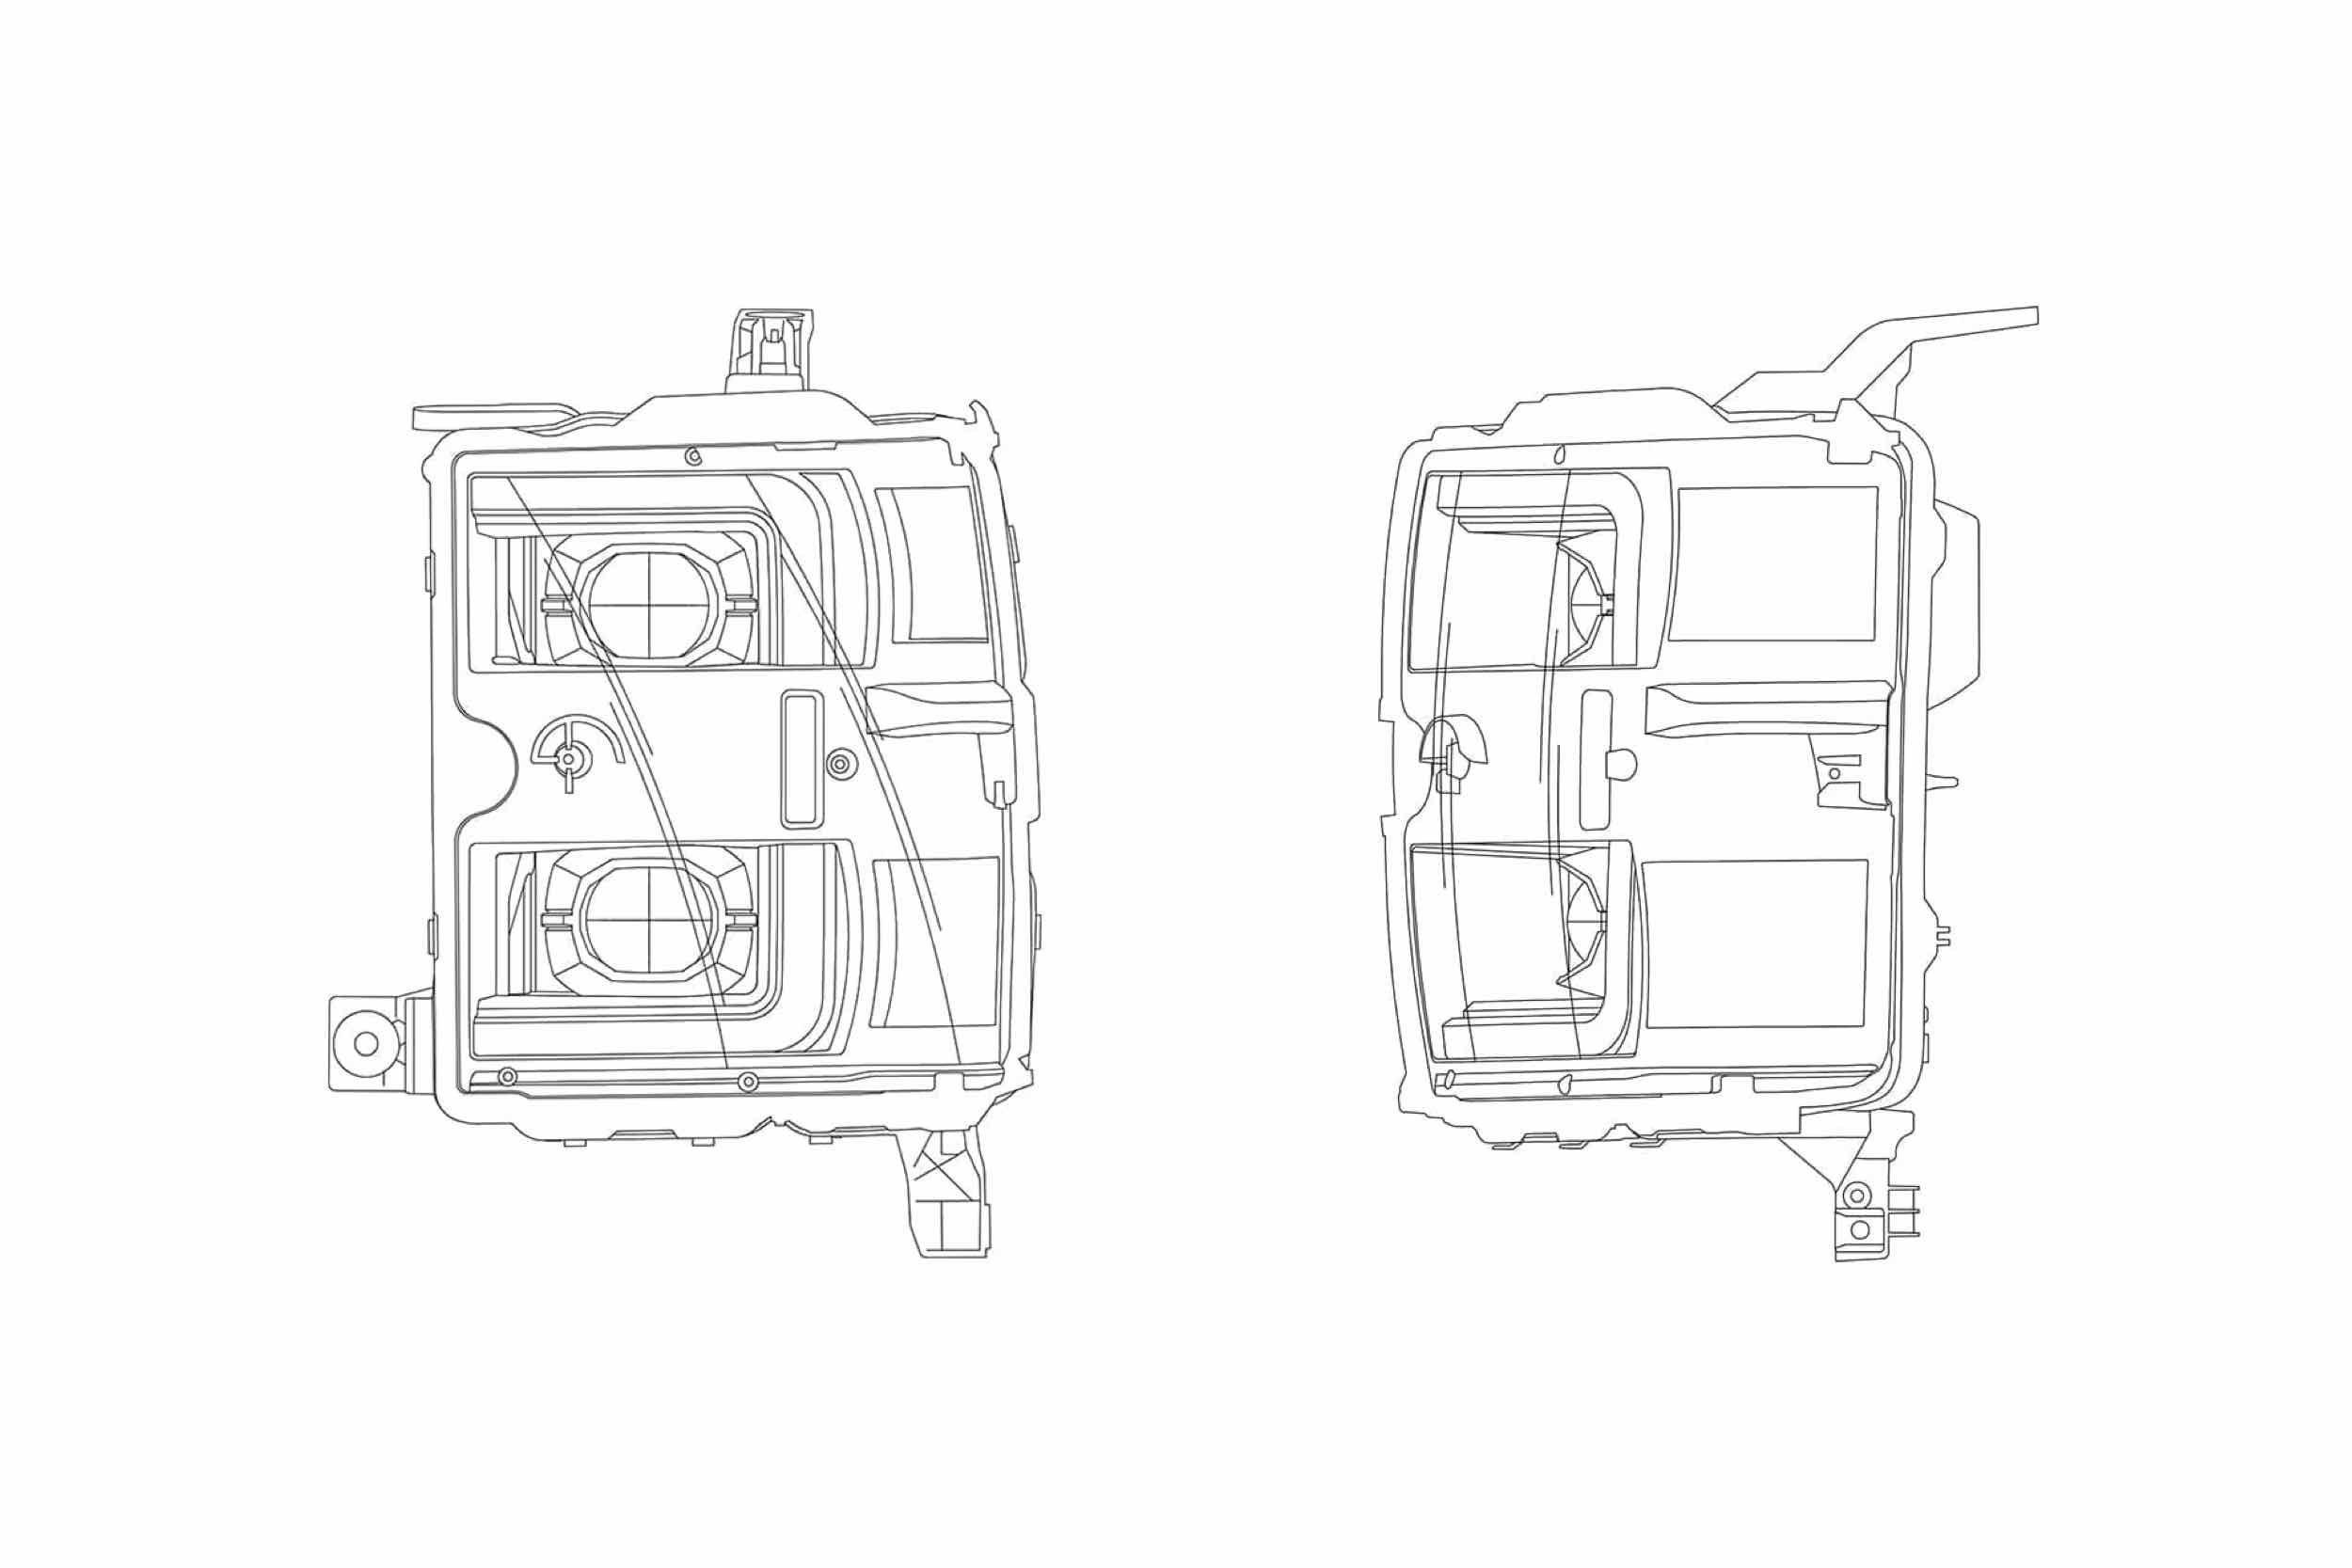 Chevy Silverado HD (15-19): AlphaRex Pro Headlights I TRS